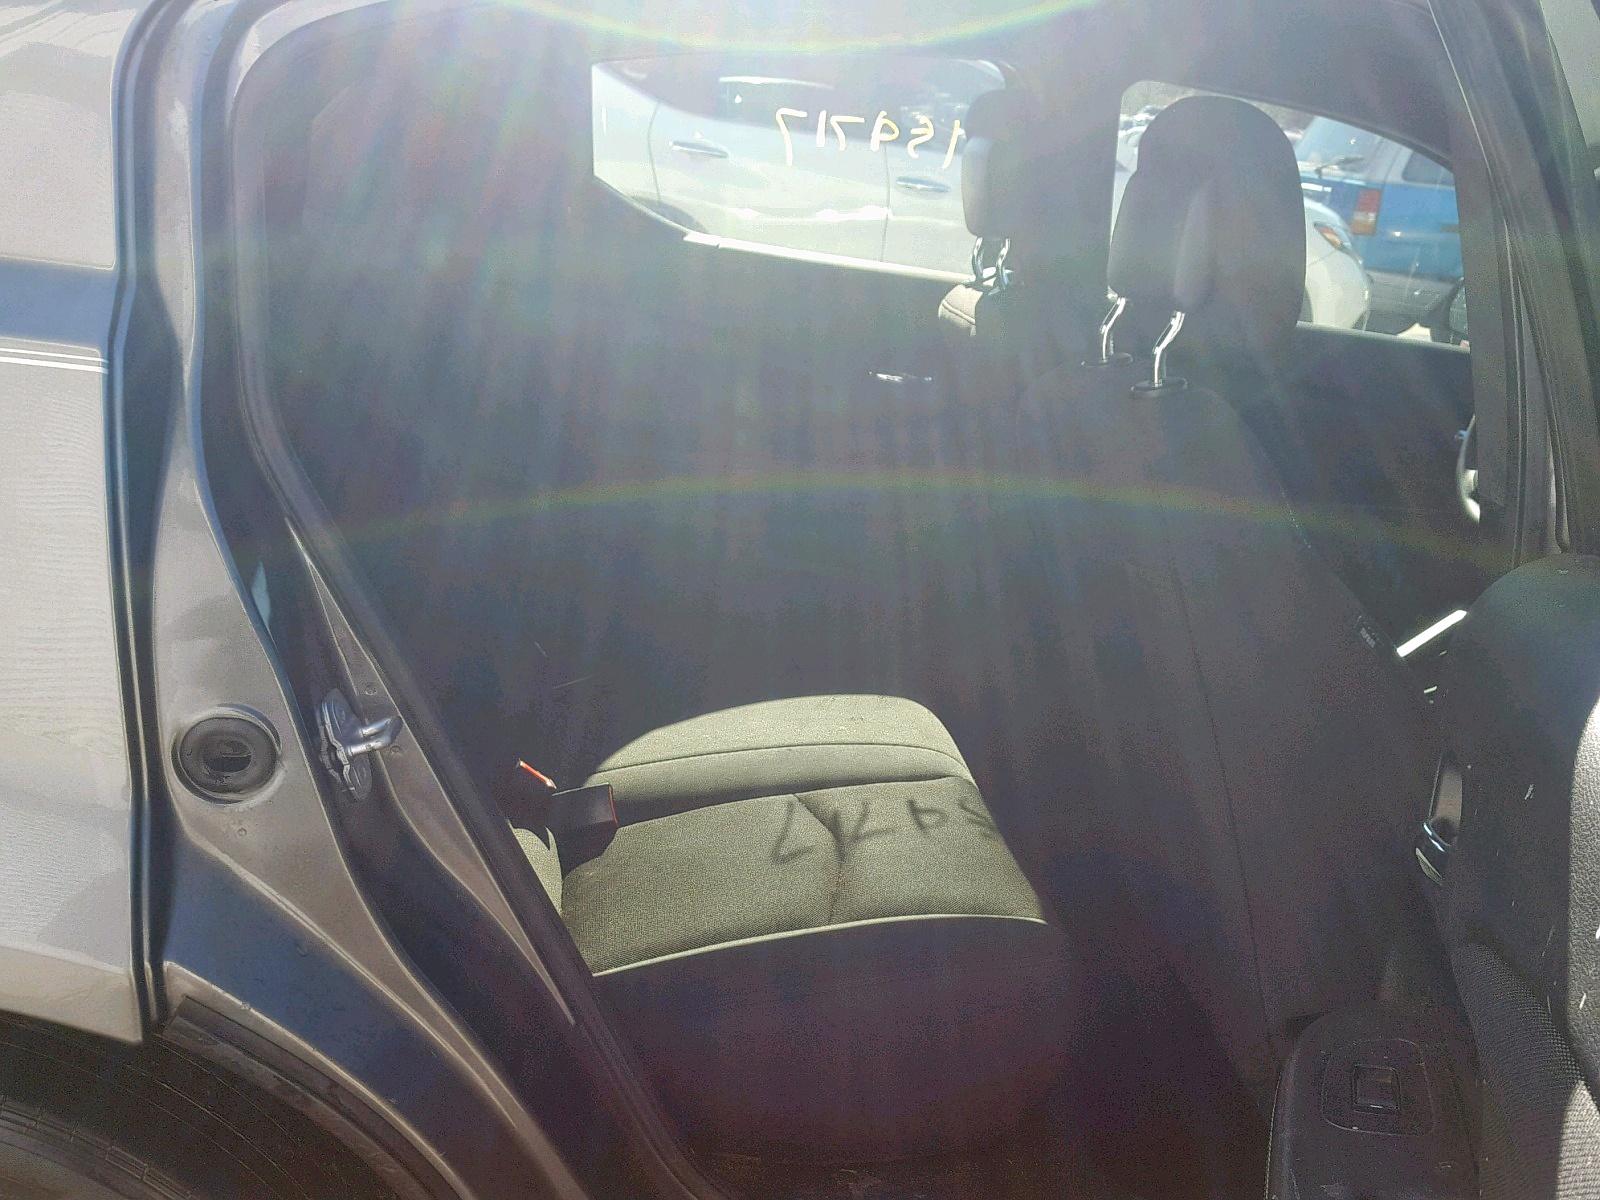 1C3CDZAB9CN148889 - 2012 Dodge Avenger Se 2.4L detail view